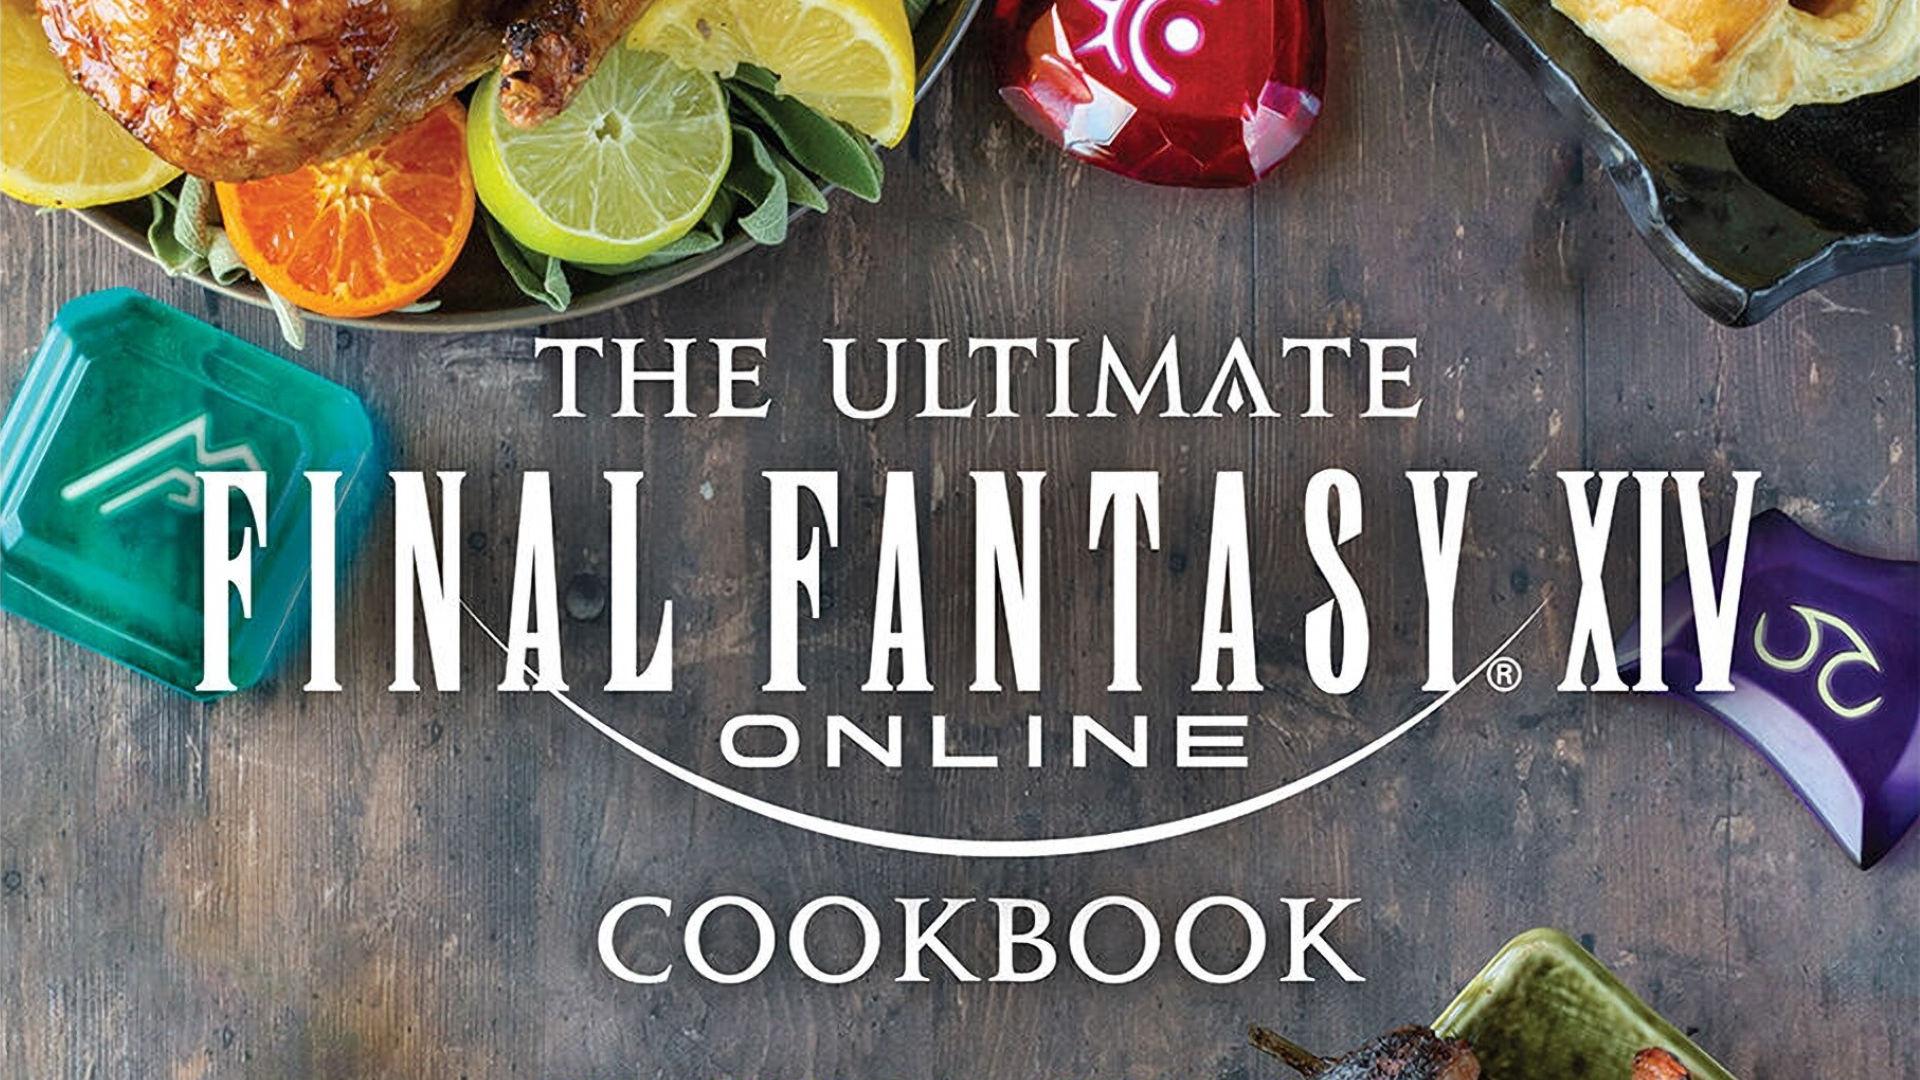 Final Fantasy XIV Ultimate Cookbook Featured